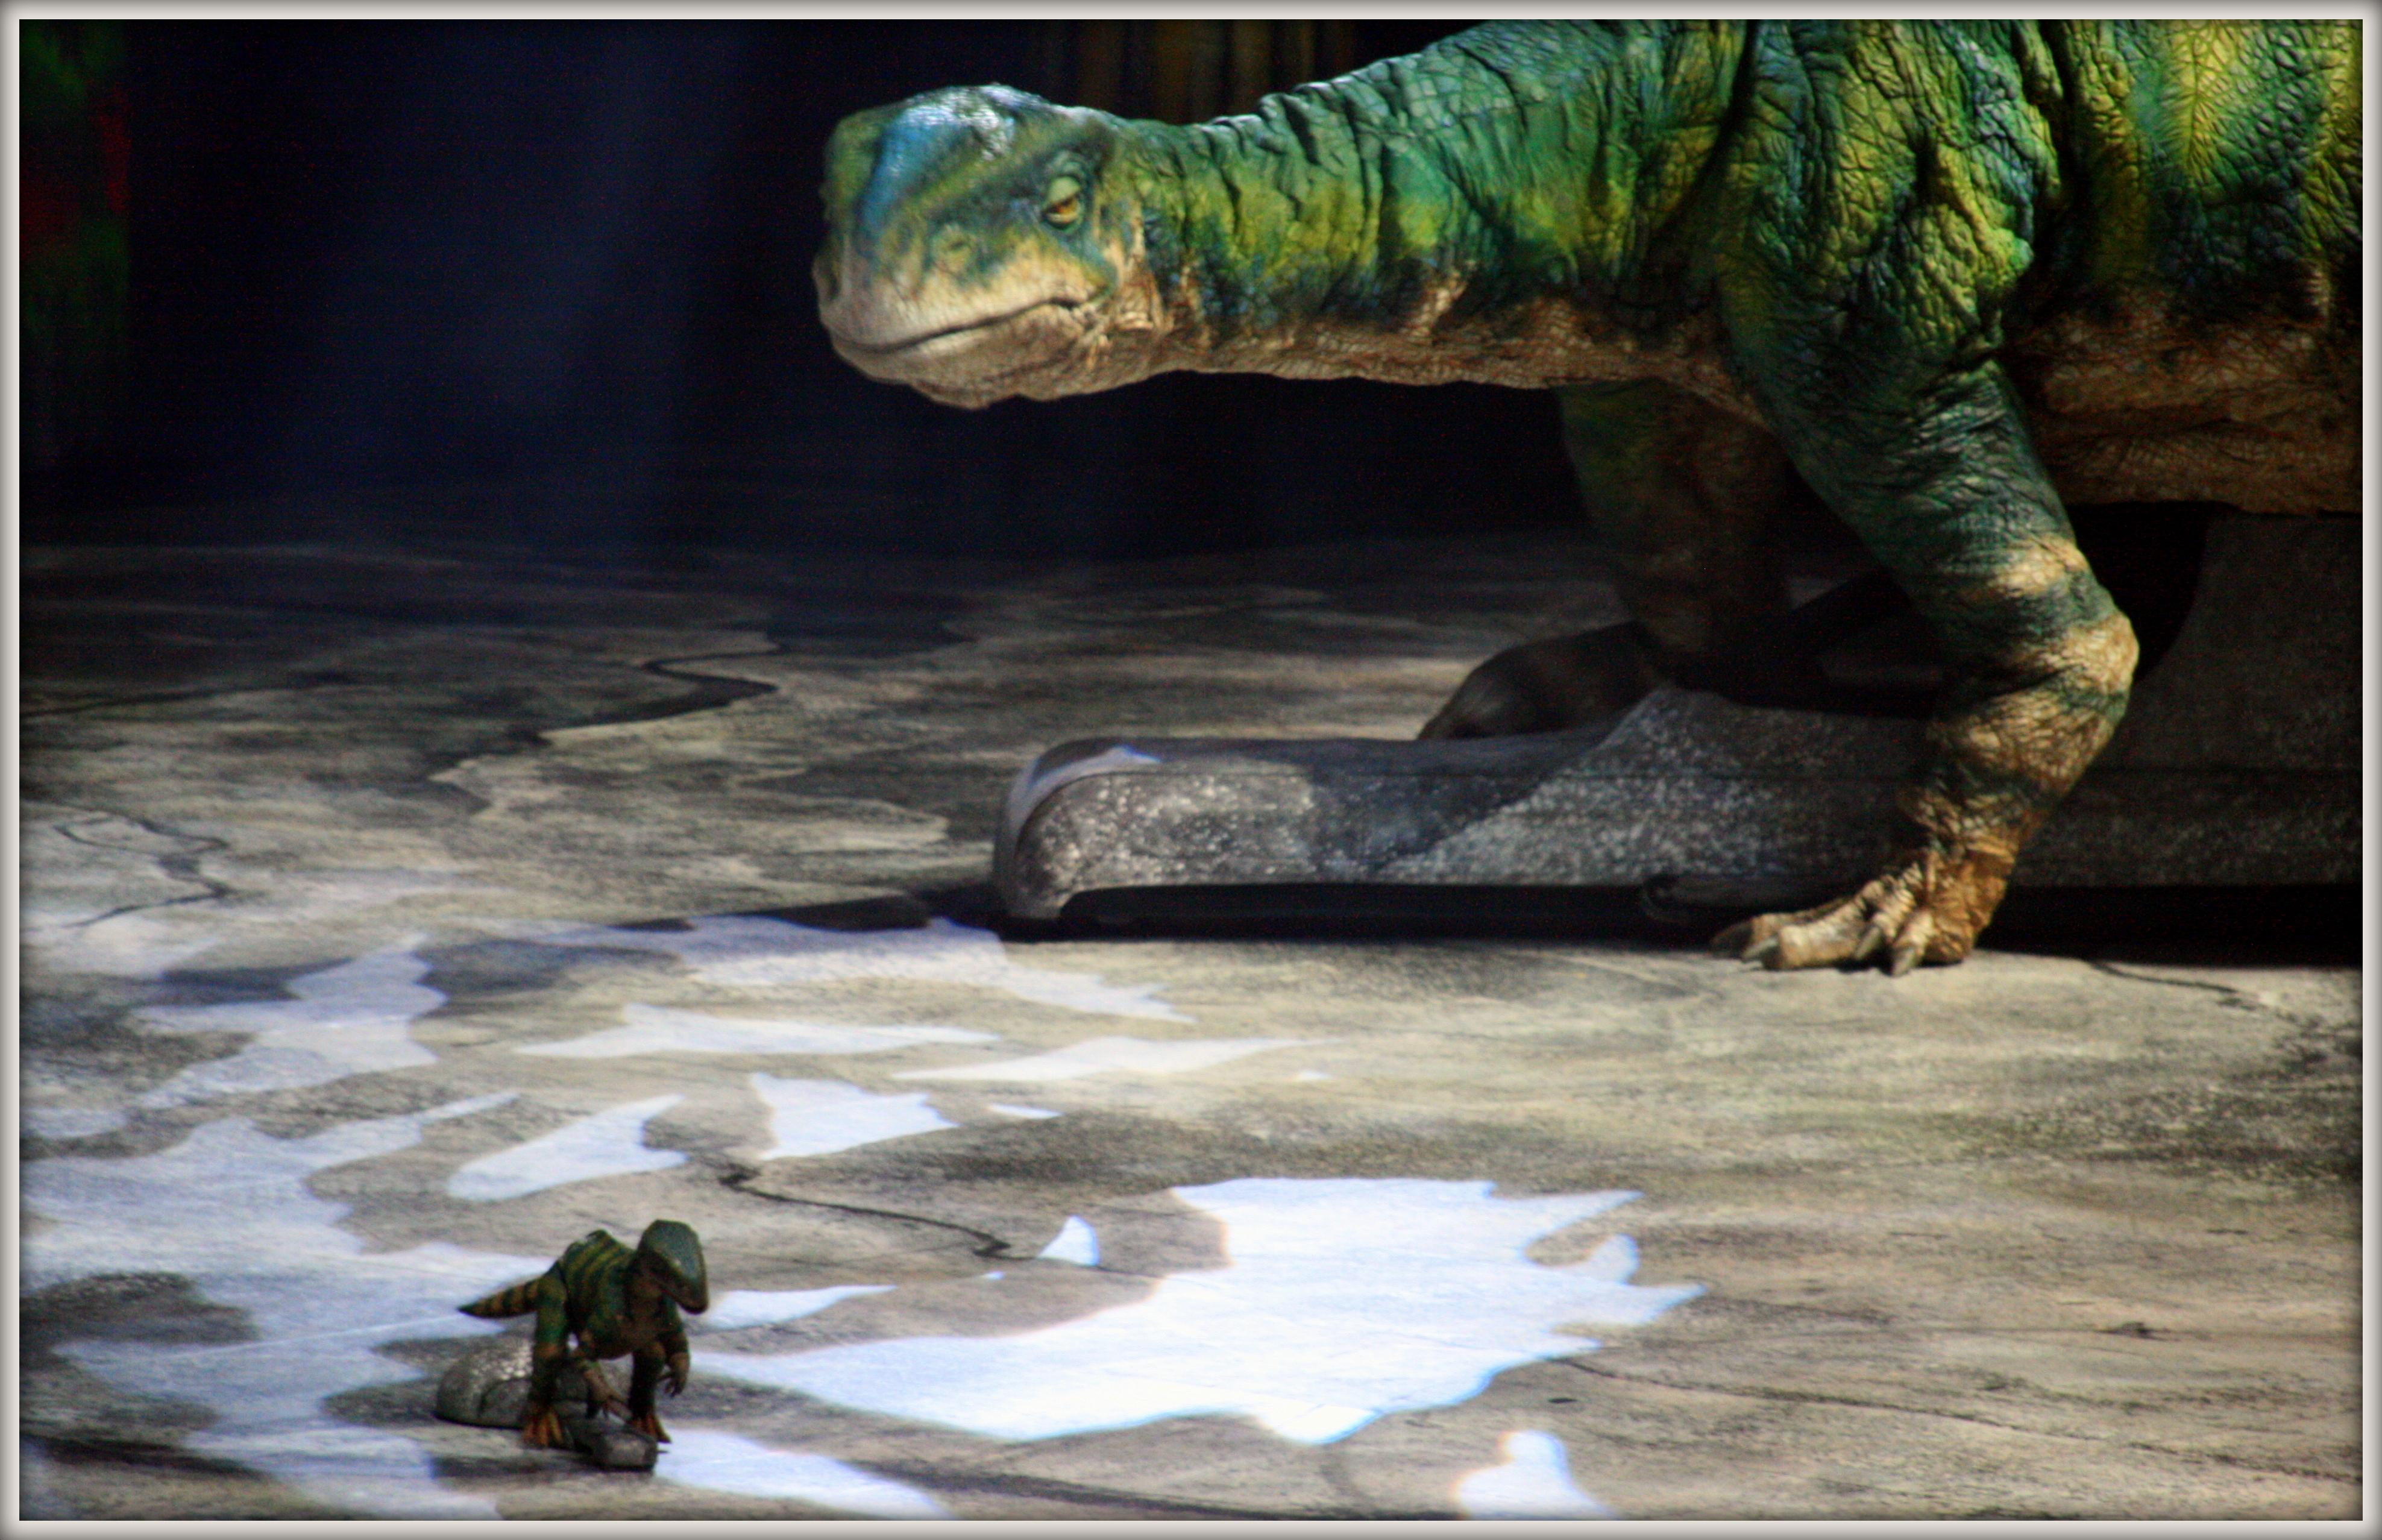 walking with dinosaurs pesaro marzo 2013 (1)